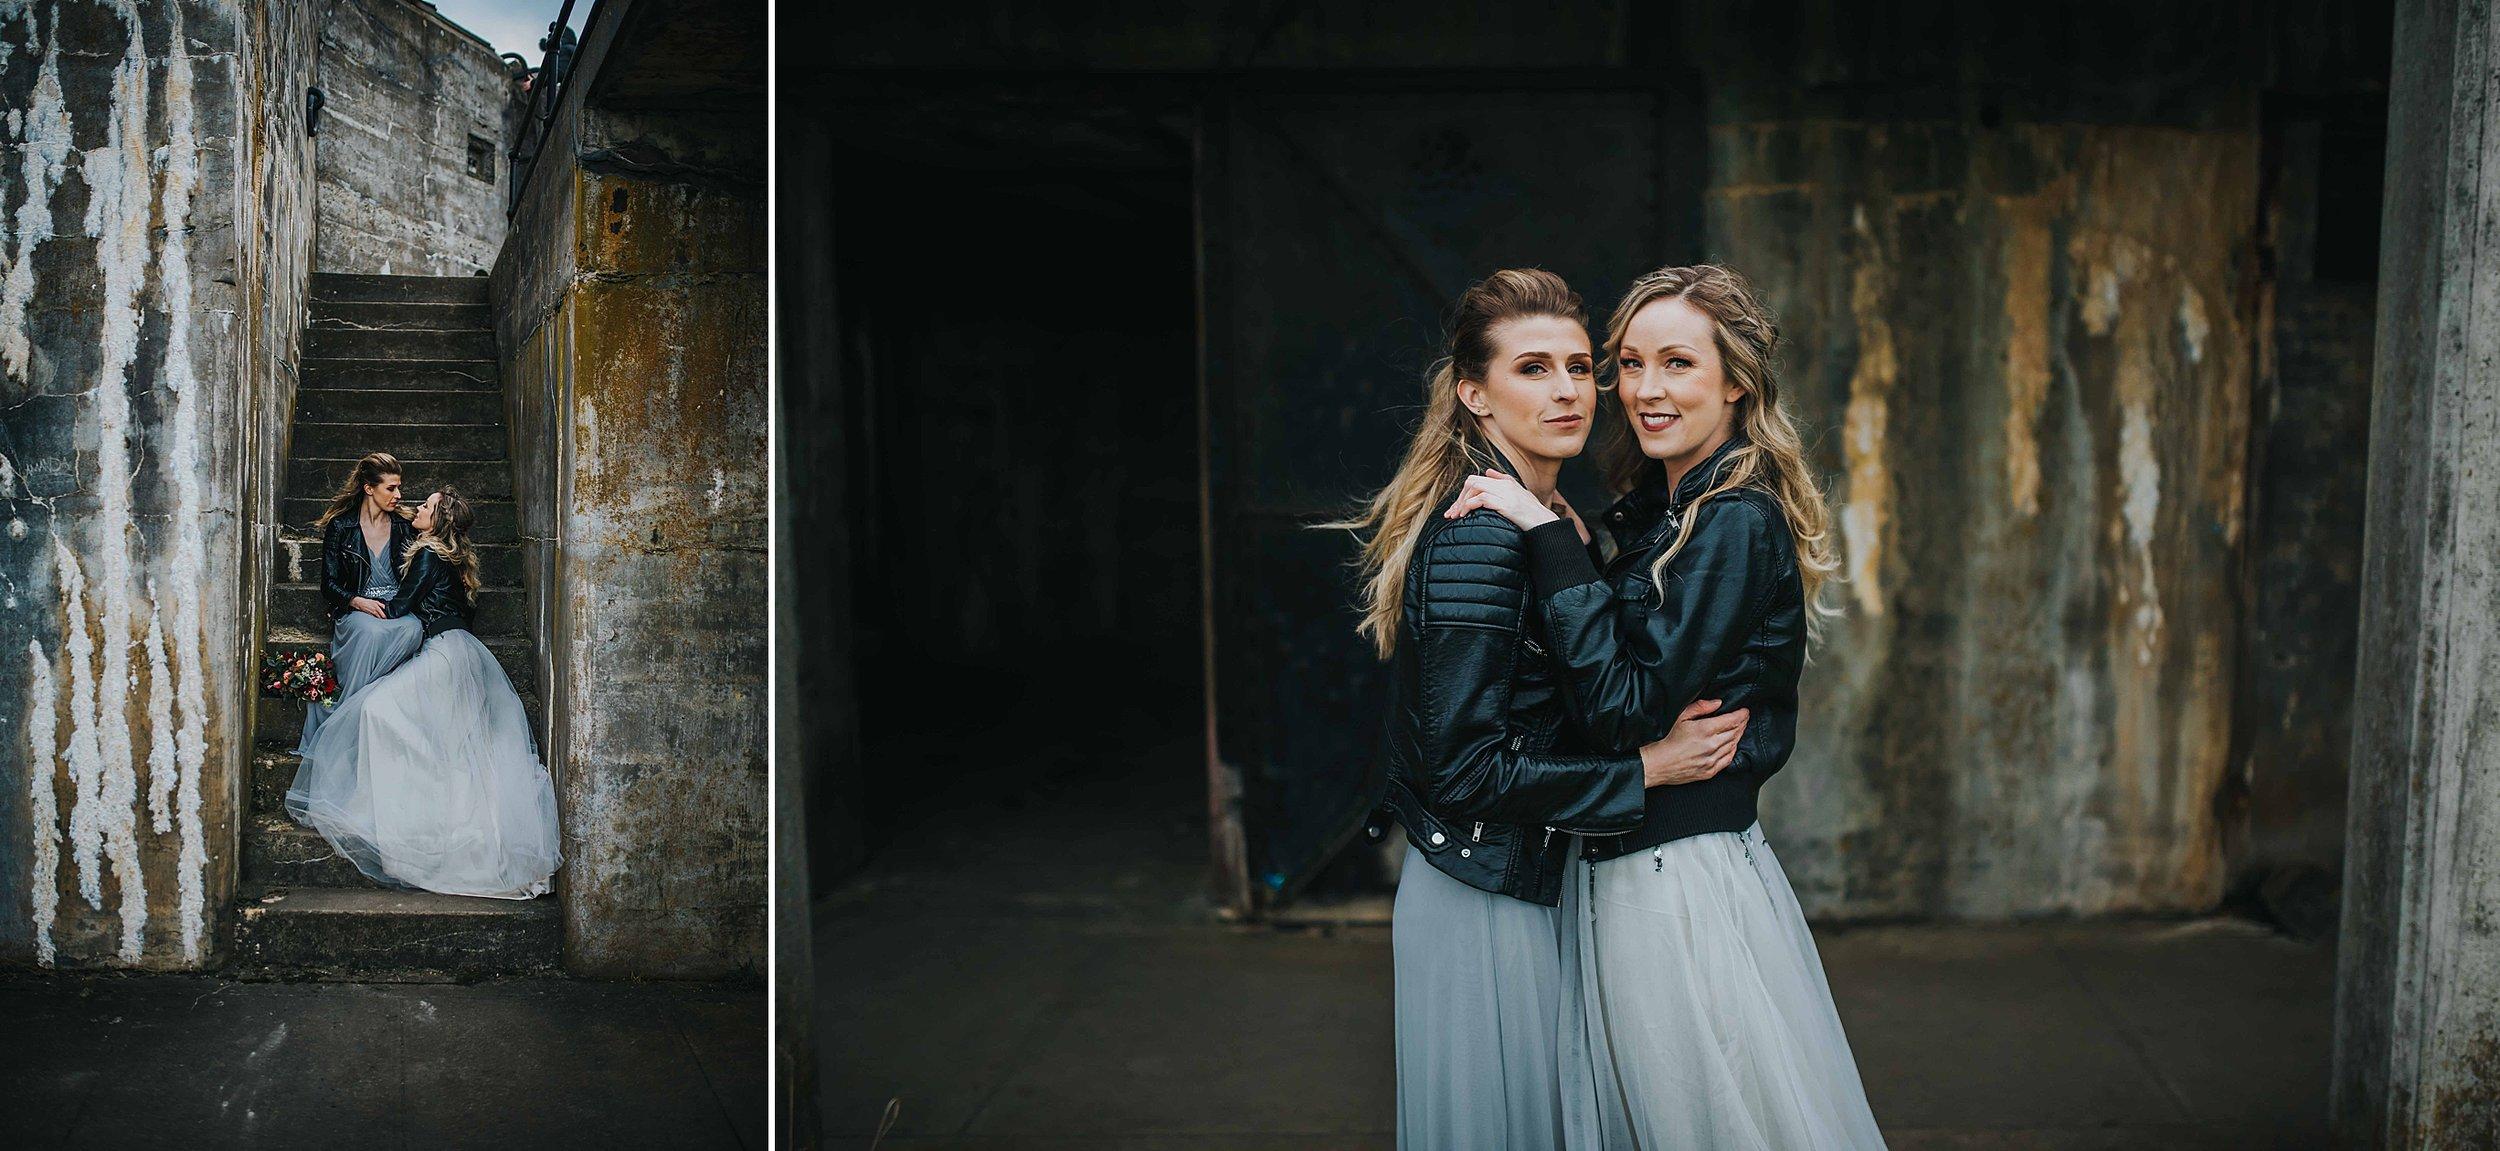 Wedding-photographer-J HODGES PHOTOGRAPHY_0243.jpg